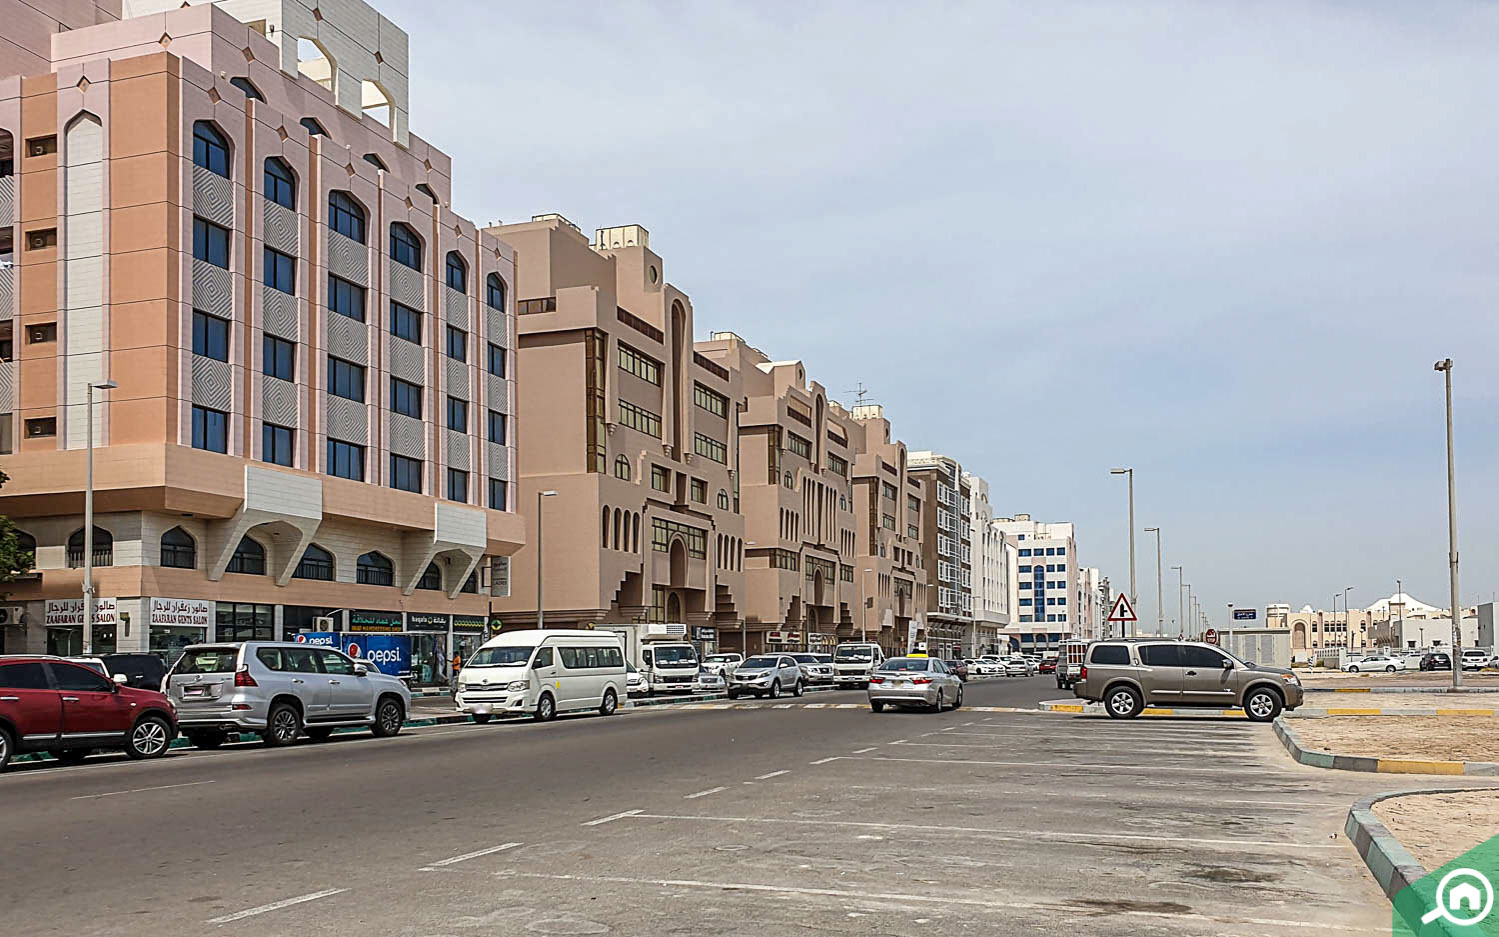 Street view of Hoshi